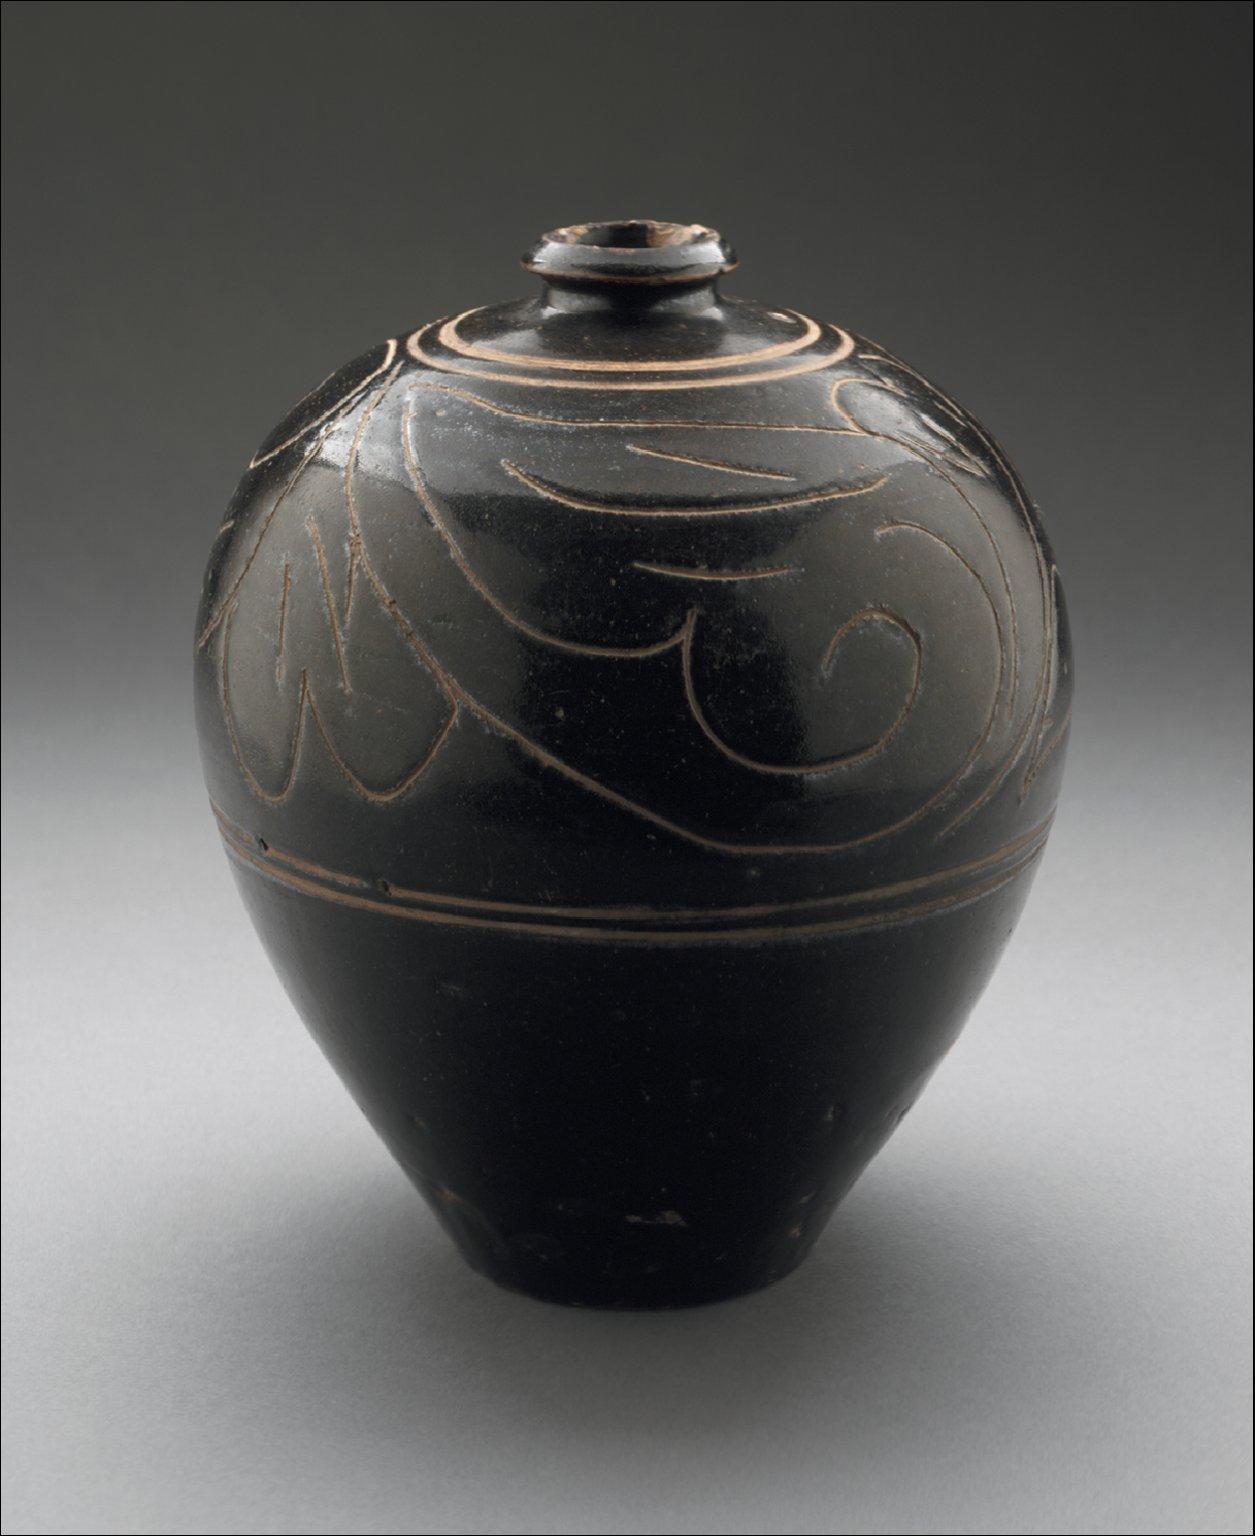 Jar (Guan) with Floral Scrolls